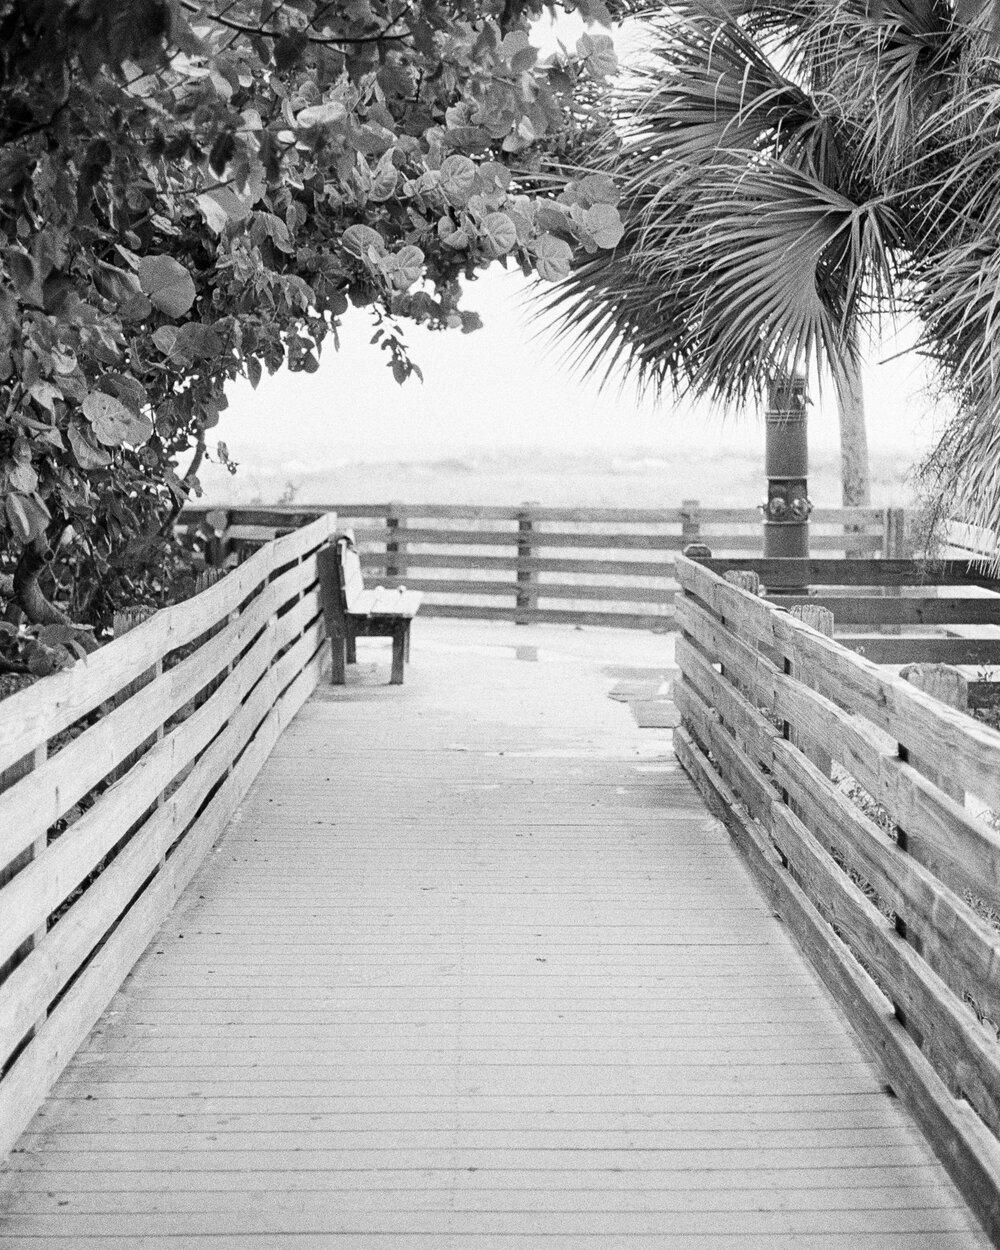 Beach-Sunset-Park-Kids-Leica-MA-29.jpg